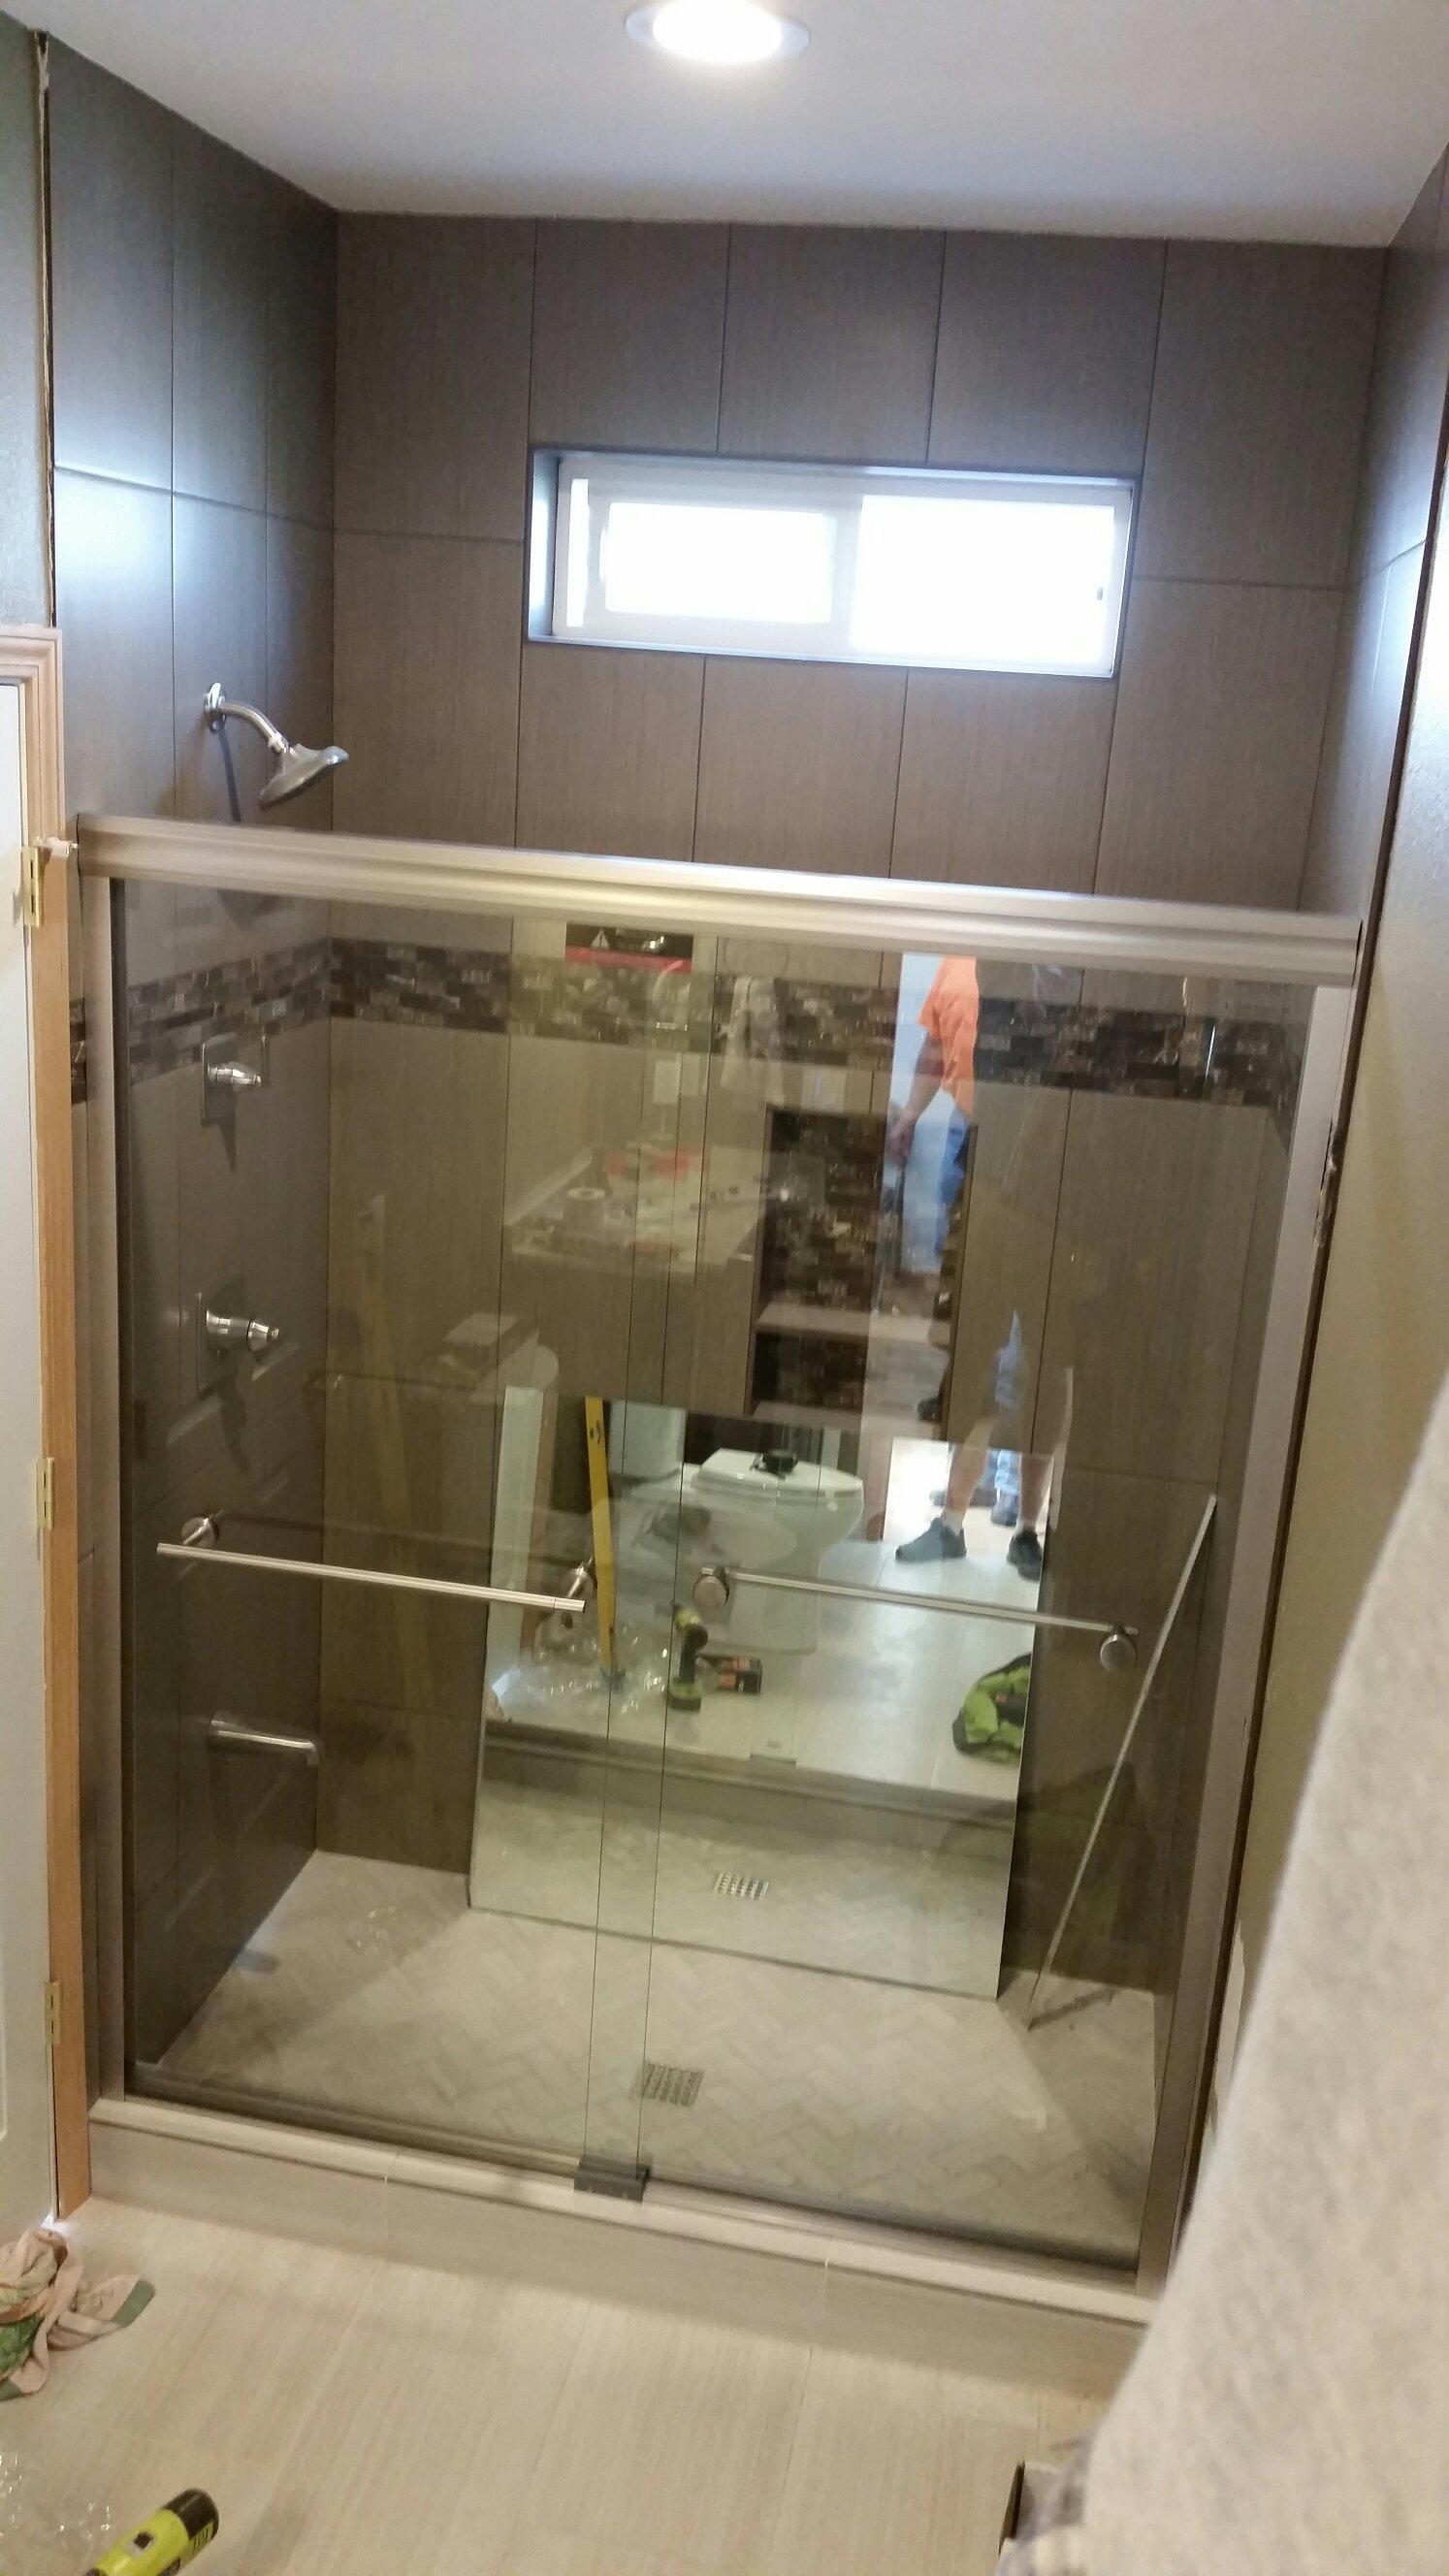 Glass Shower Door Installation Hedgehog Home Services Llc